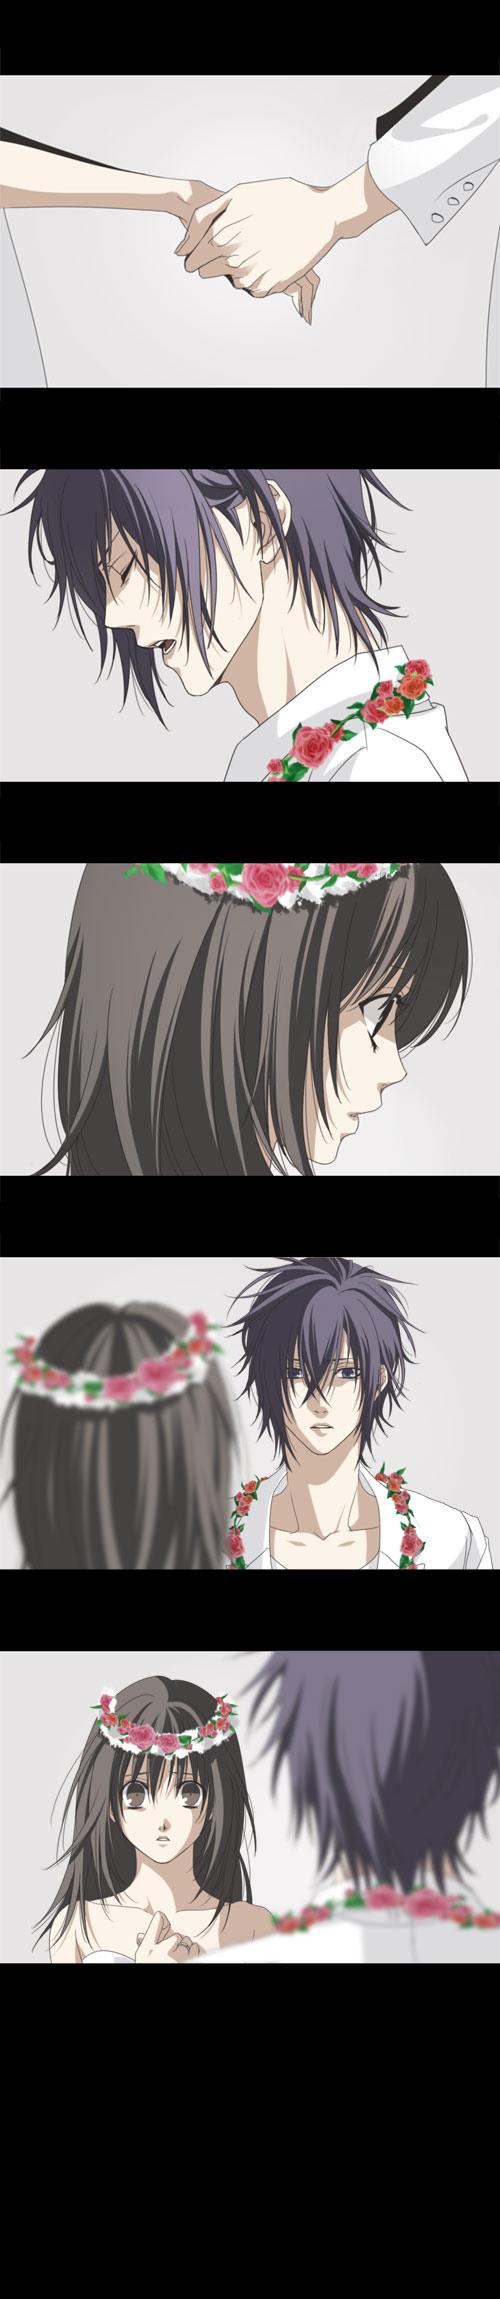 Tags: Anime, Mocchiri Oyaji, IDEA FACTORY, Saitou Hajime (Hakuouki), Yukimura Chizuru, Pixiv, Fanart, Just Be Friends